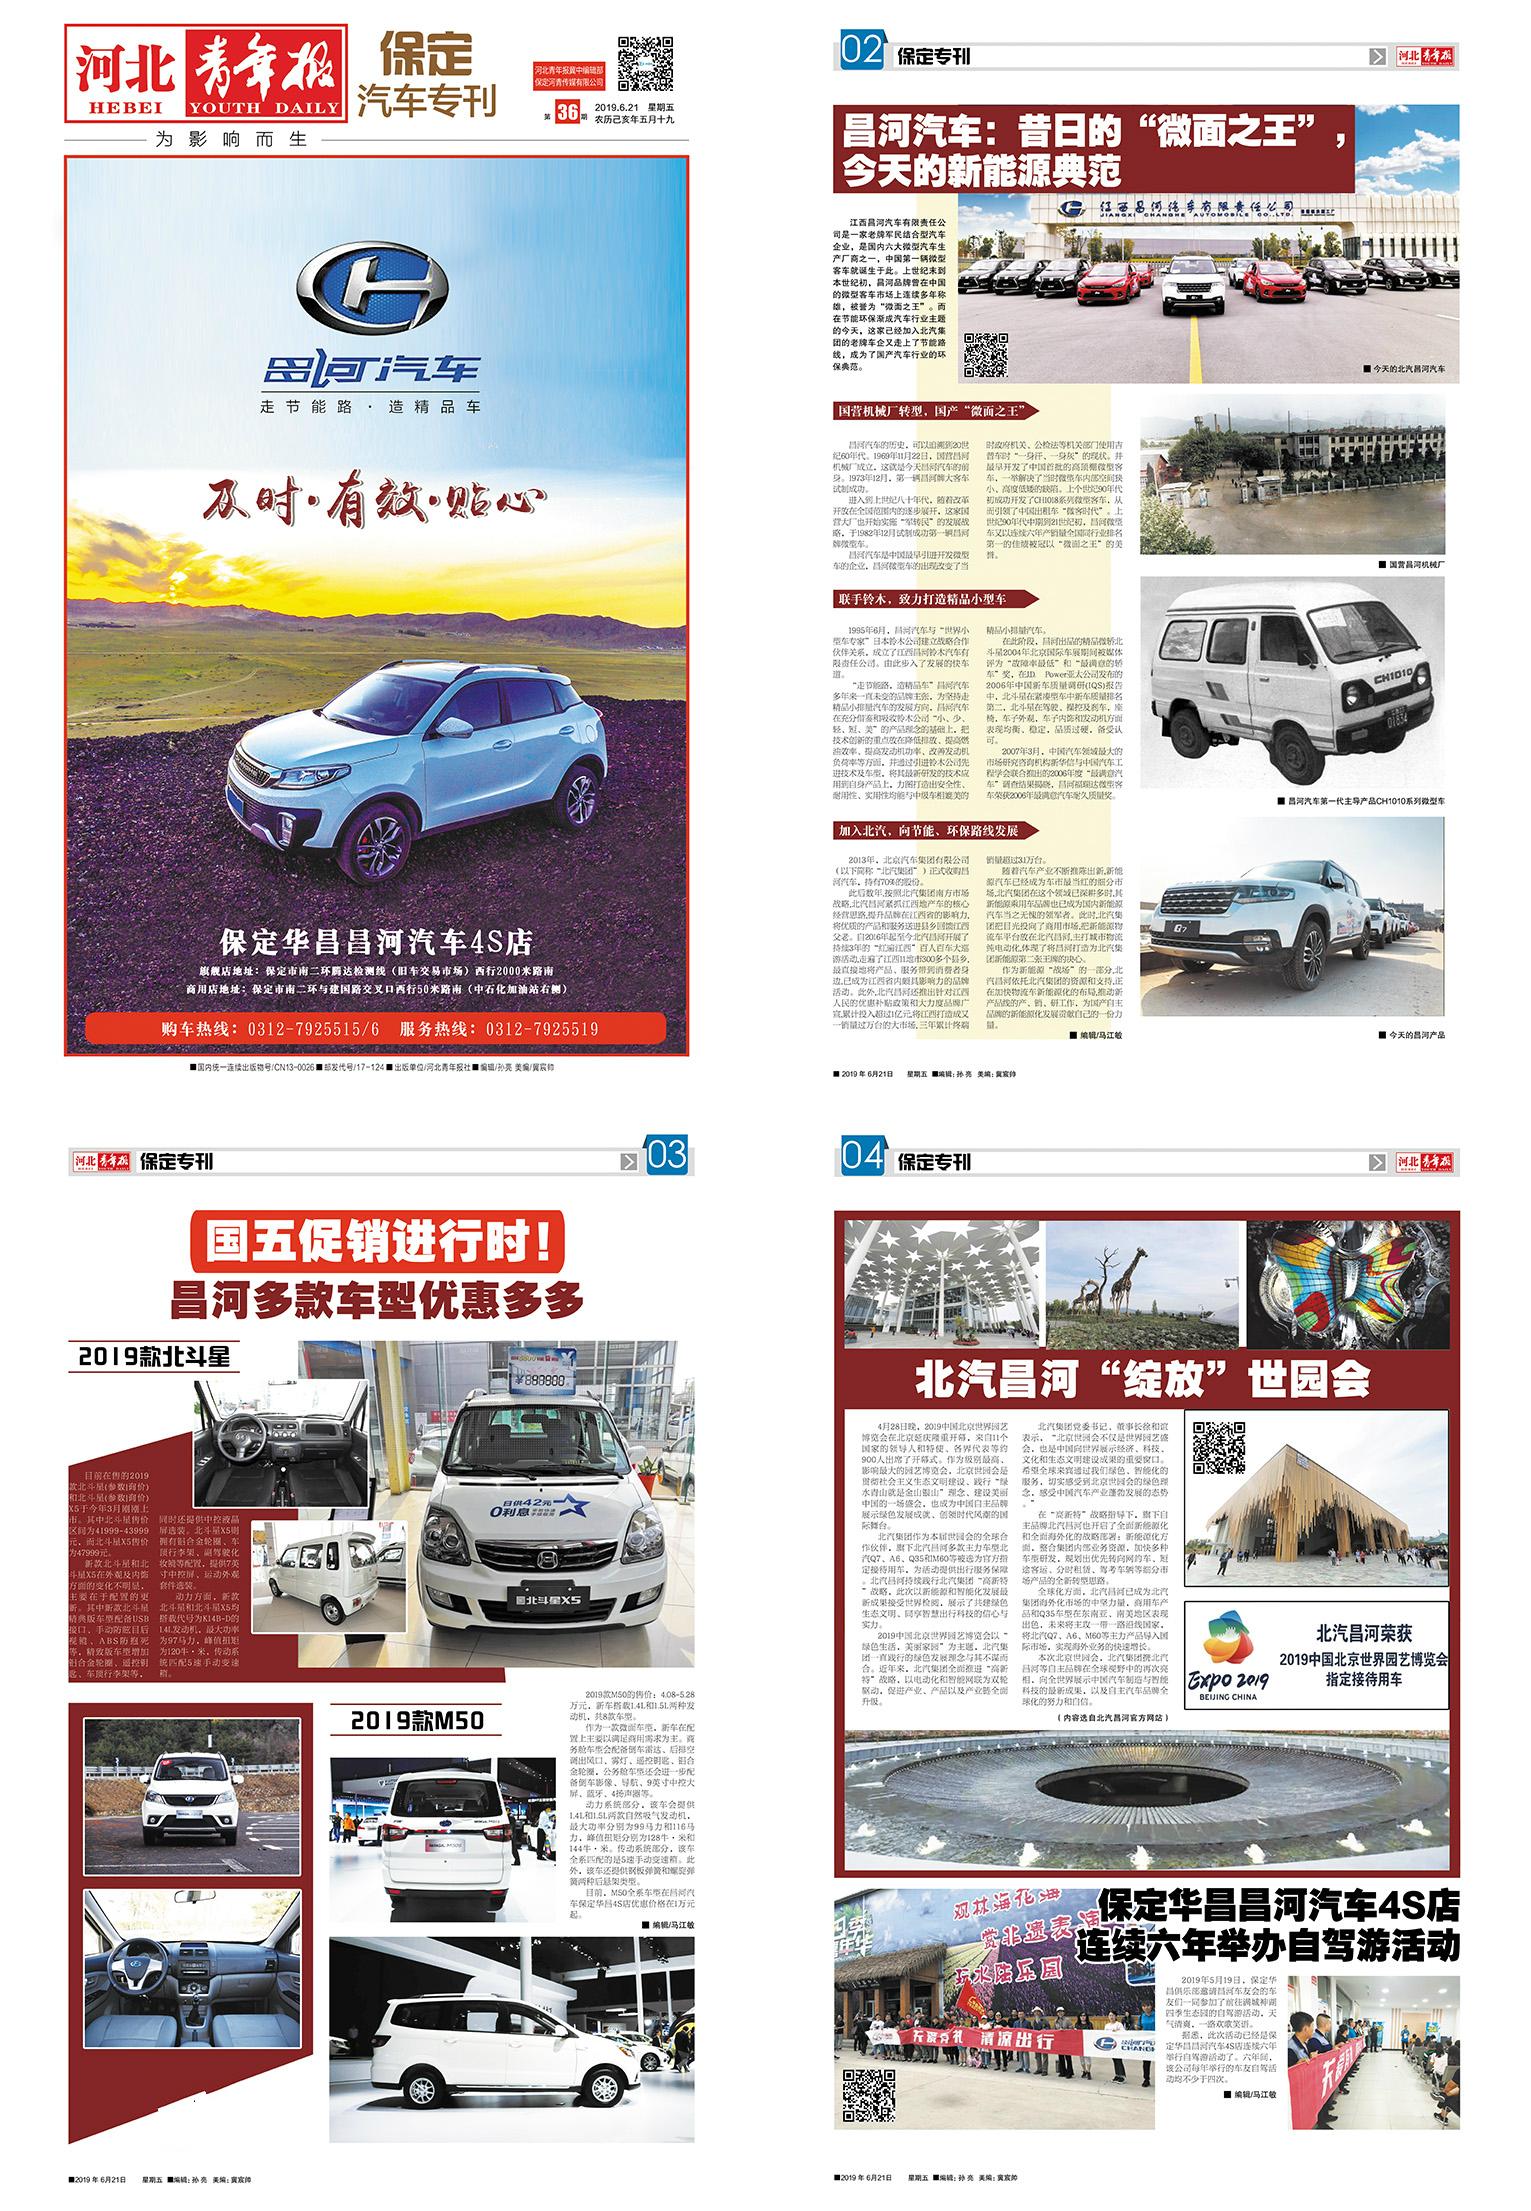 http://www.bdxyx.com/baodingfangchan/29358.html